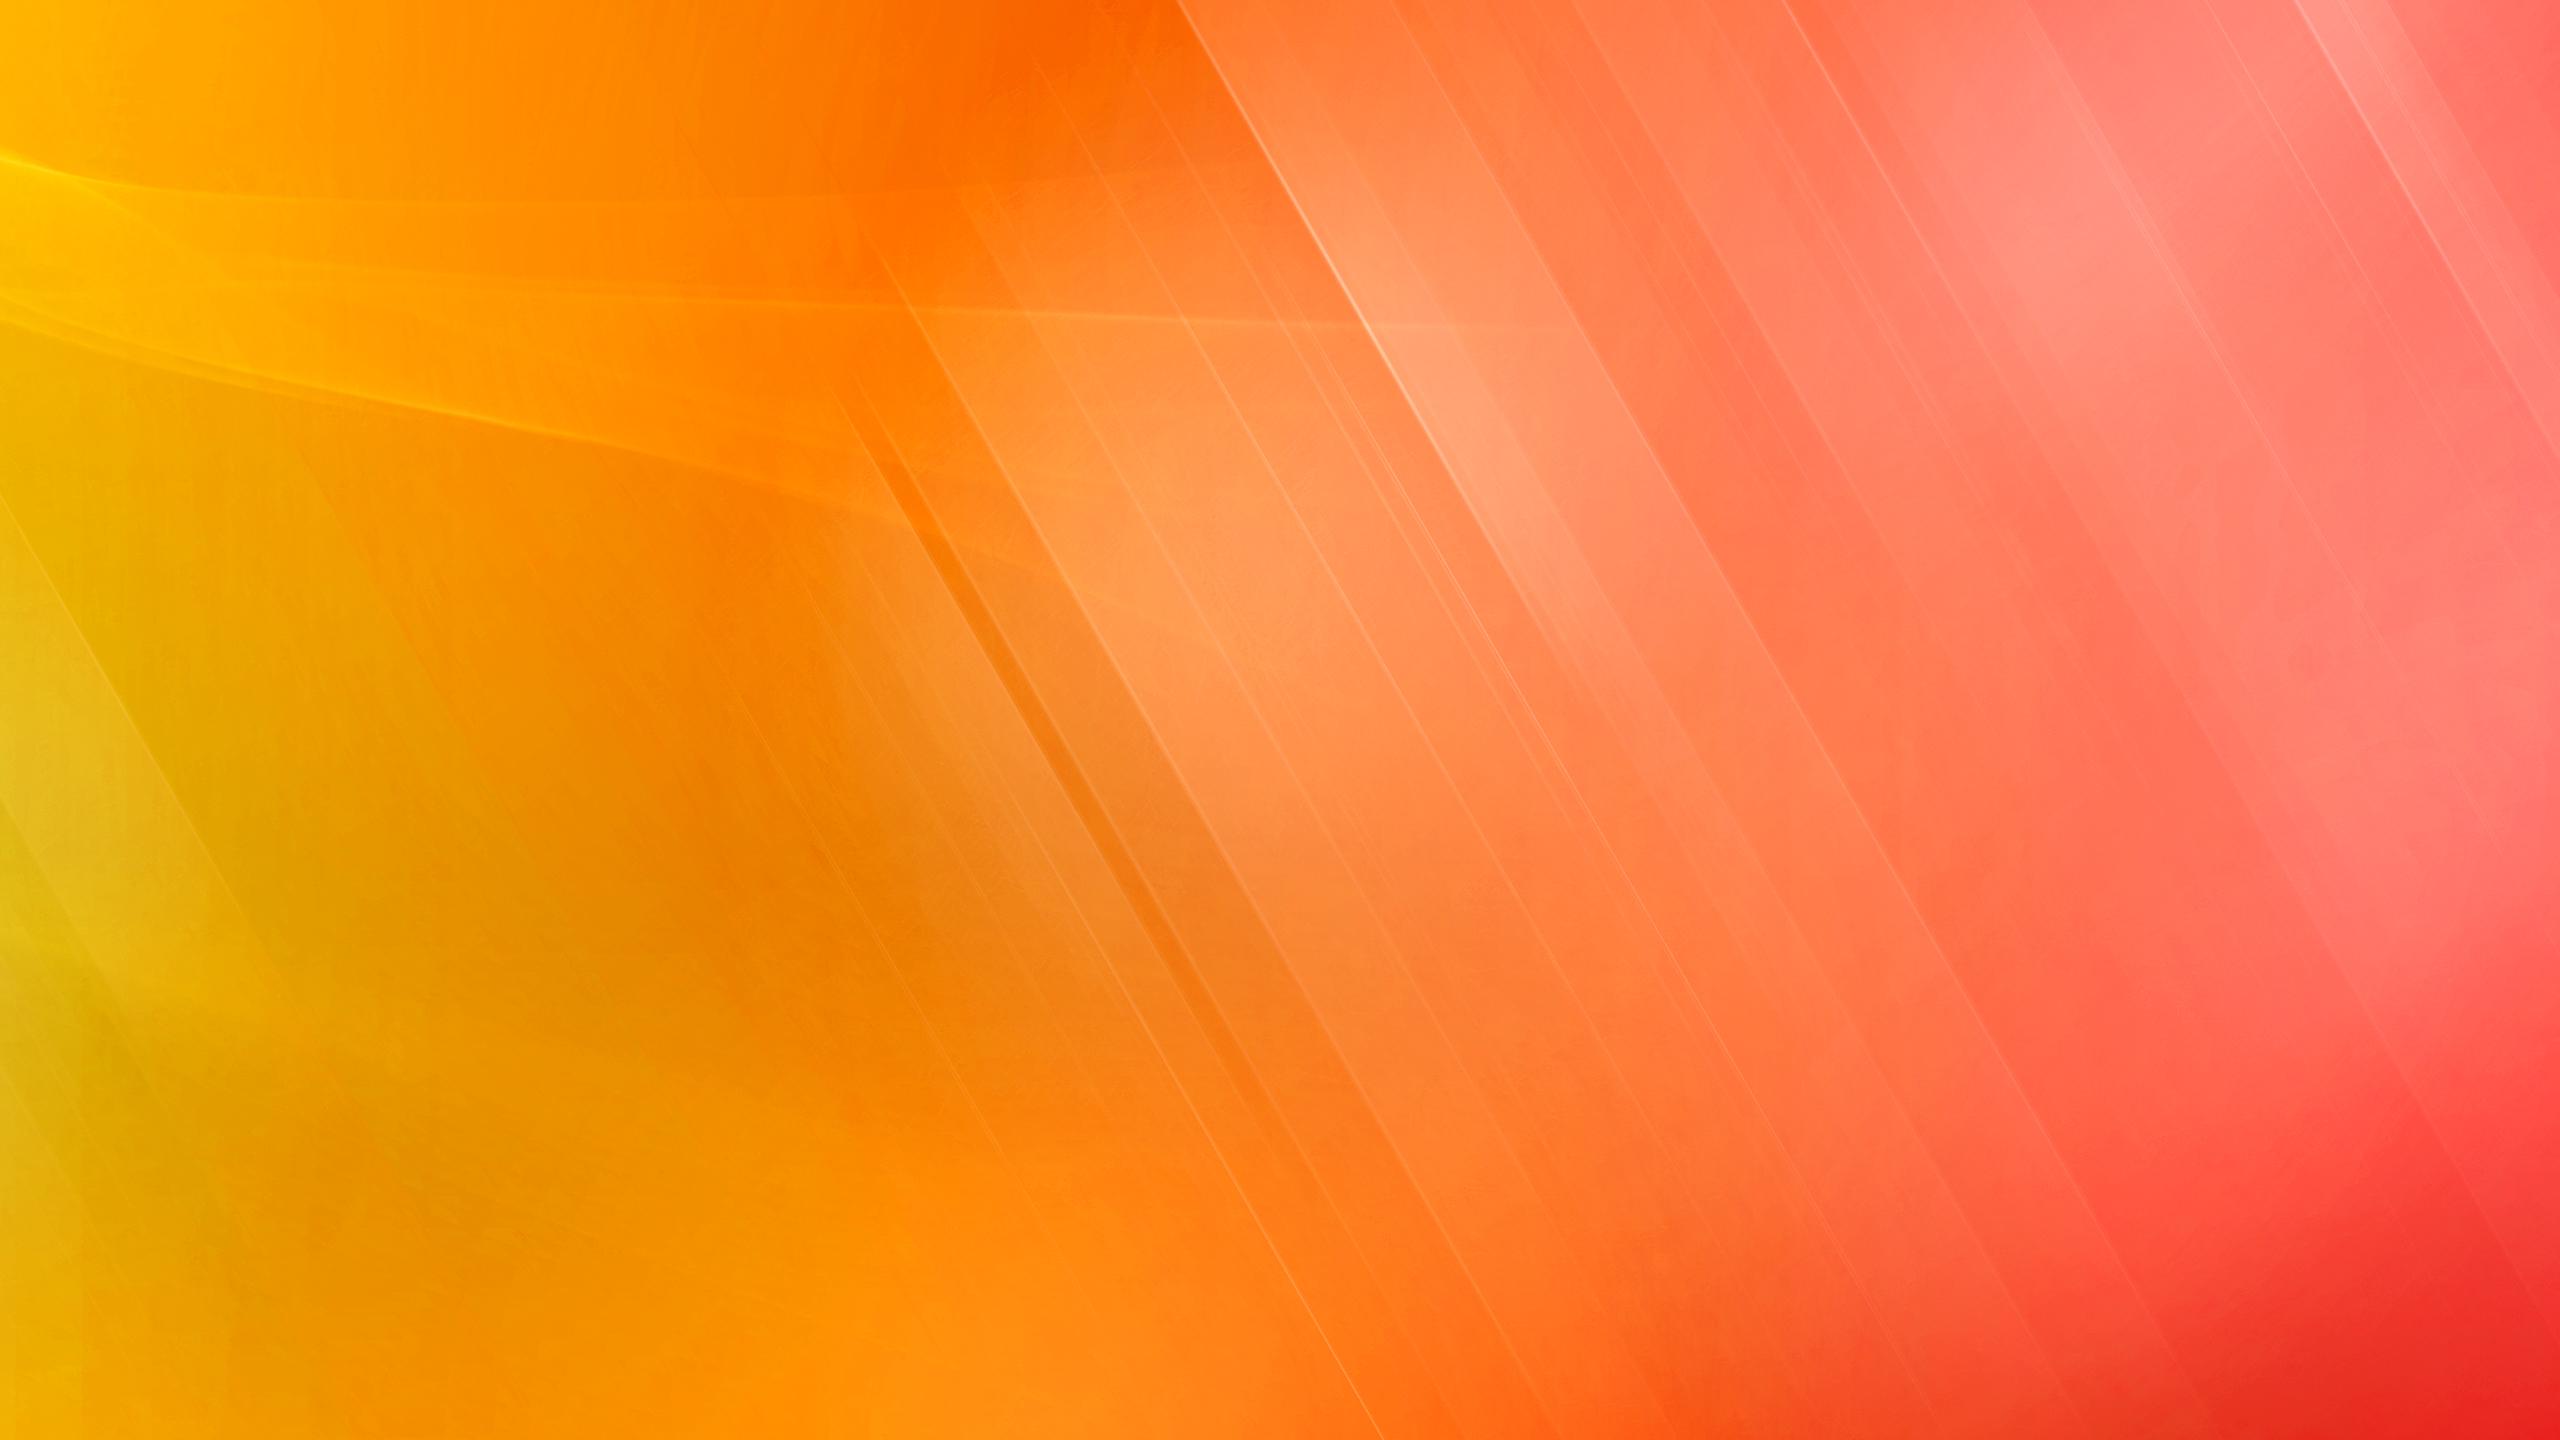 Orange%20Lines%20HD505925591